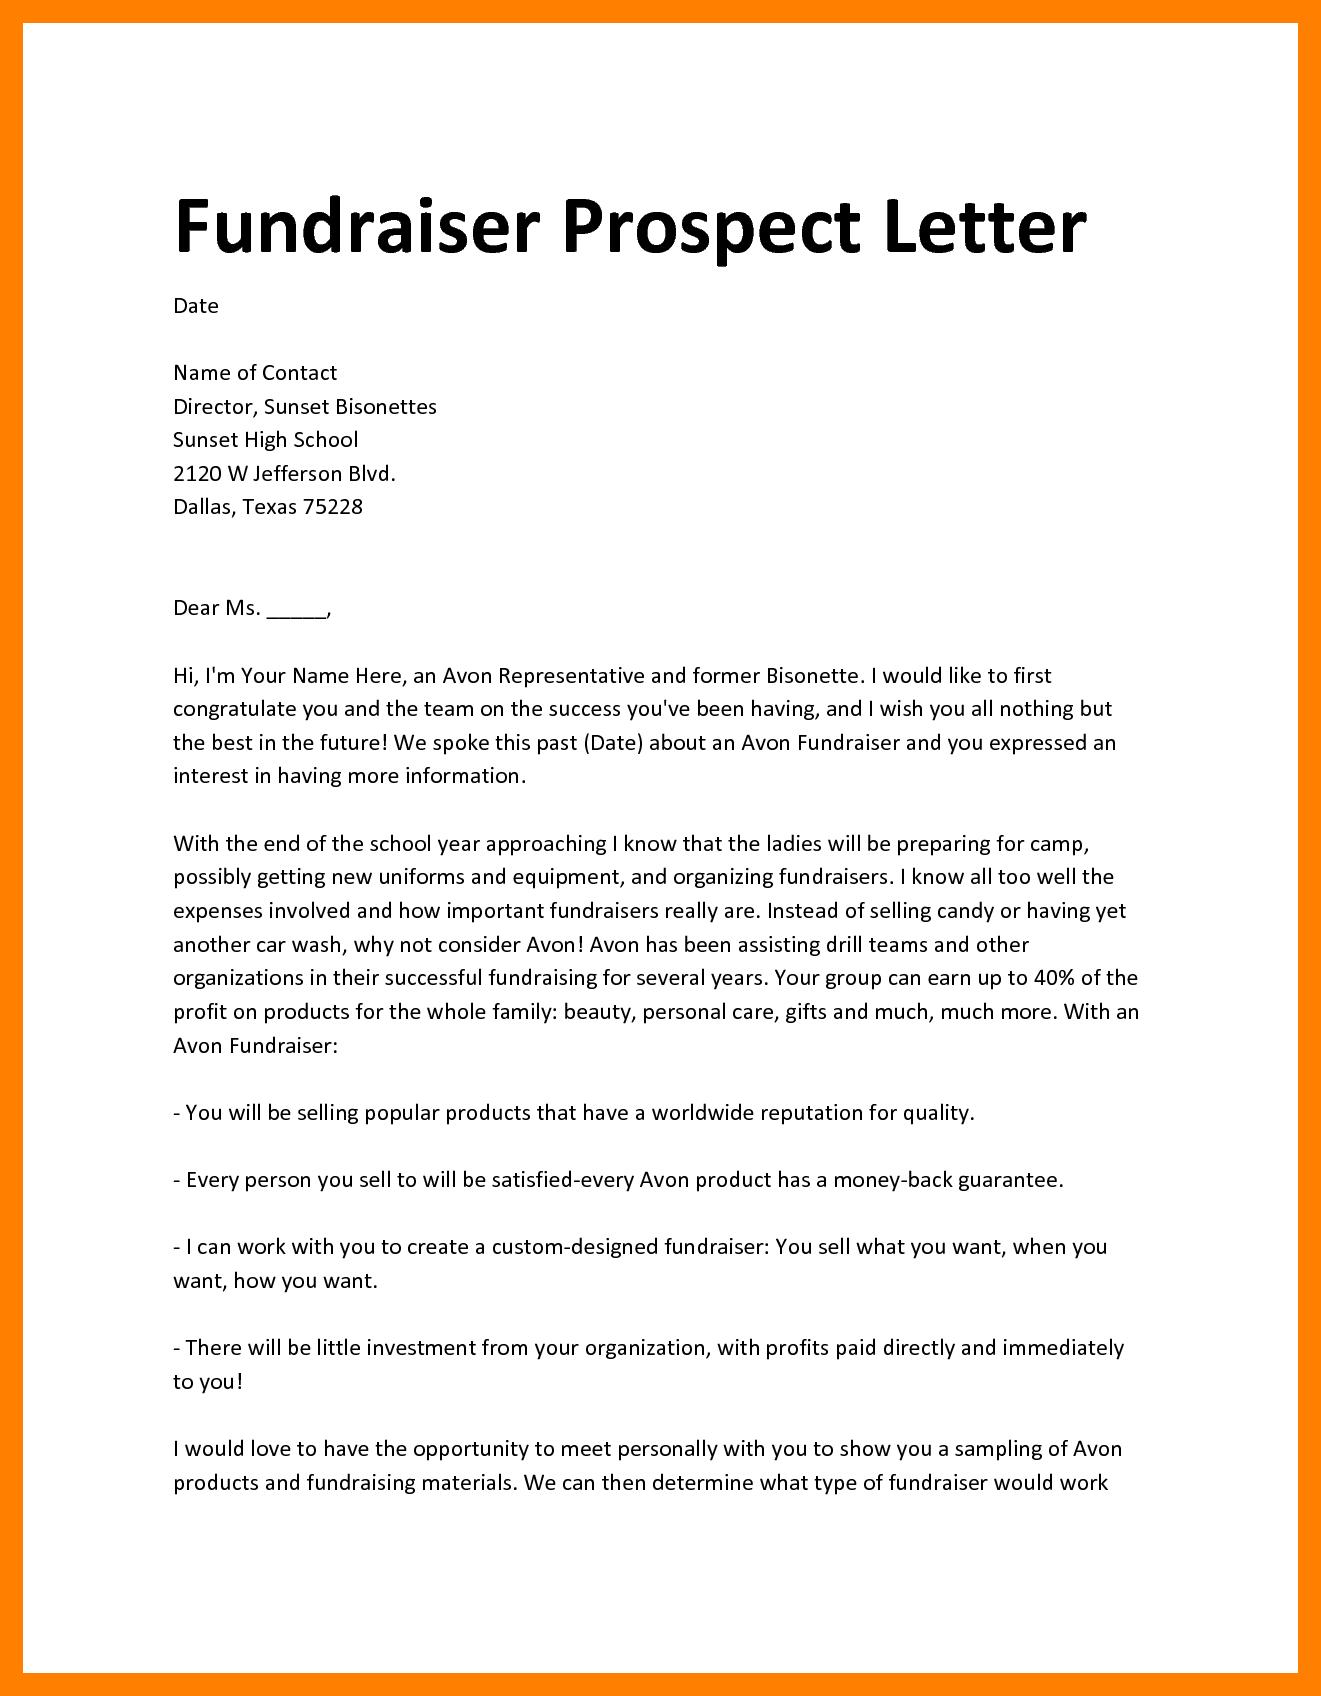 Fundraising Proposal Template  Reptile Shop Birmingham With Fundraiser Proposal Template